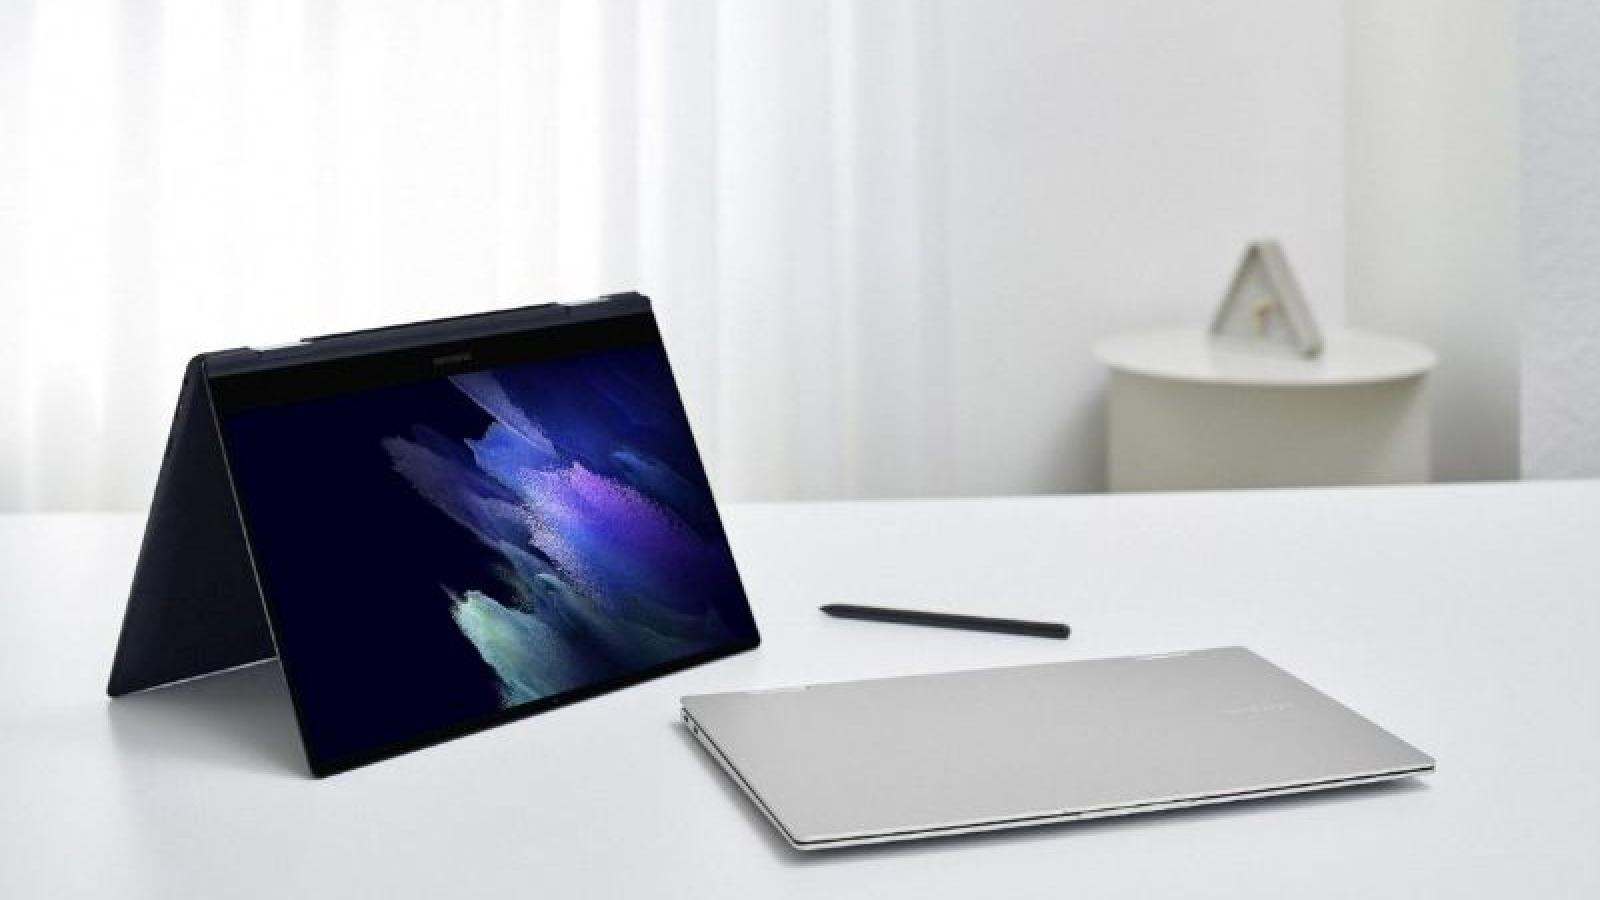 Samsung tung loạt Galaxy Book Pro thách thức Apple MacBook